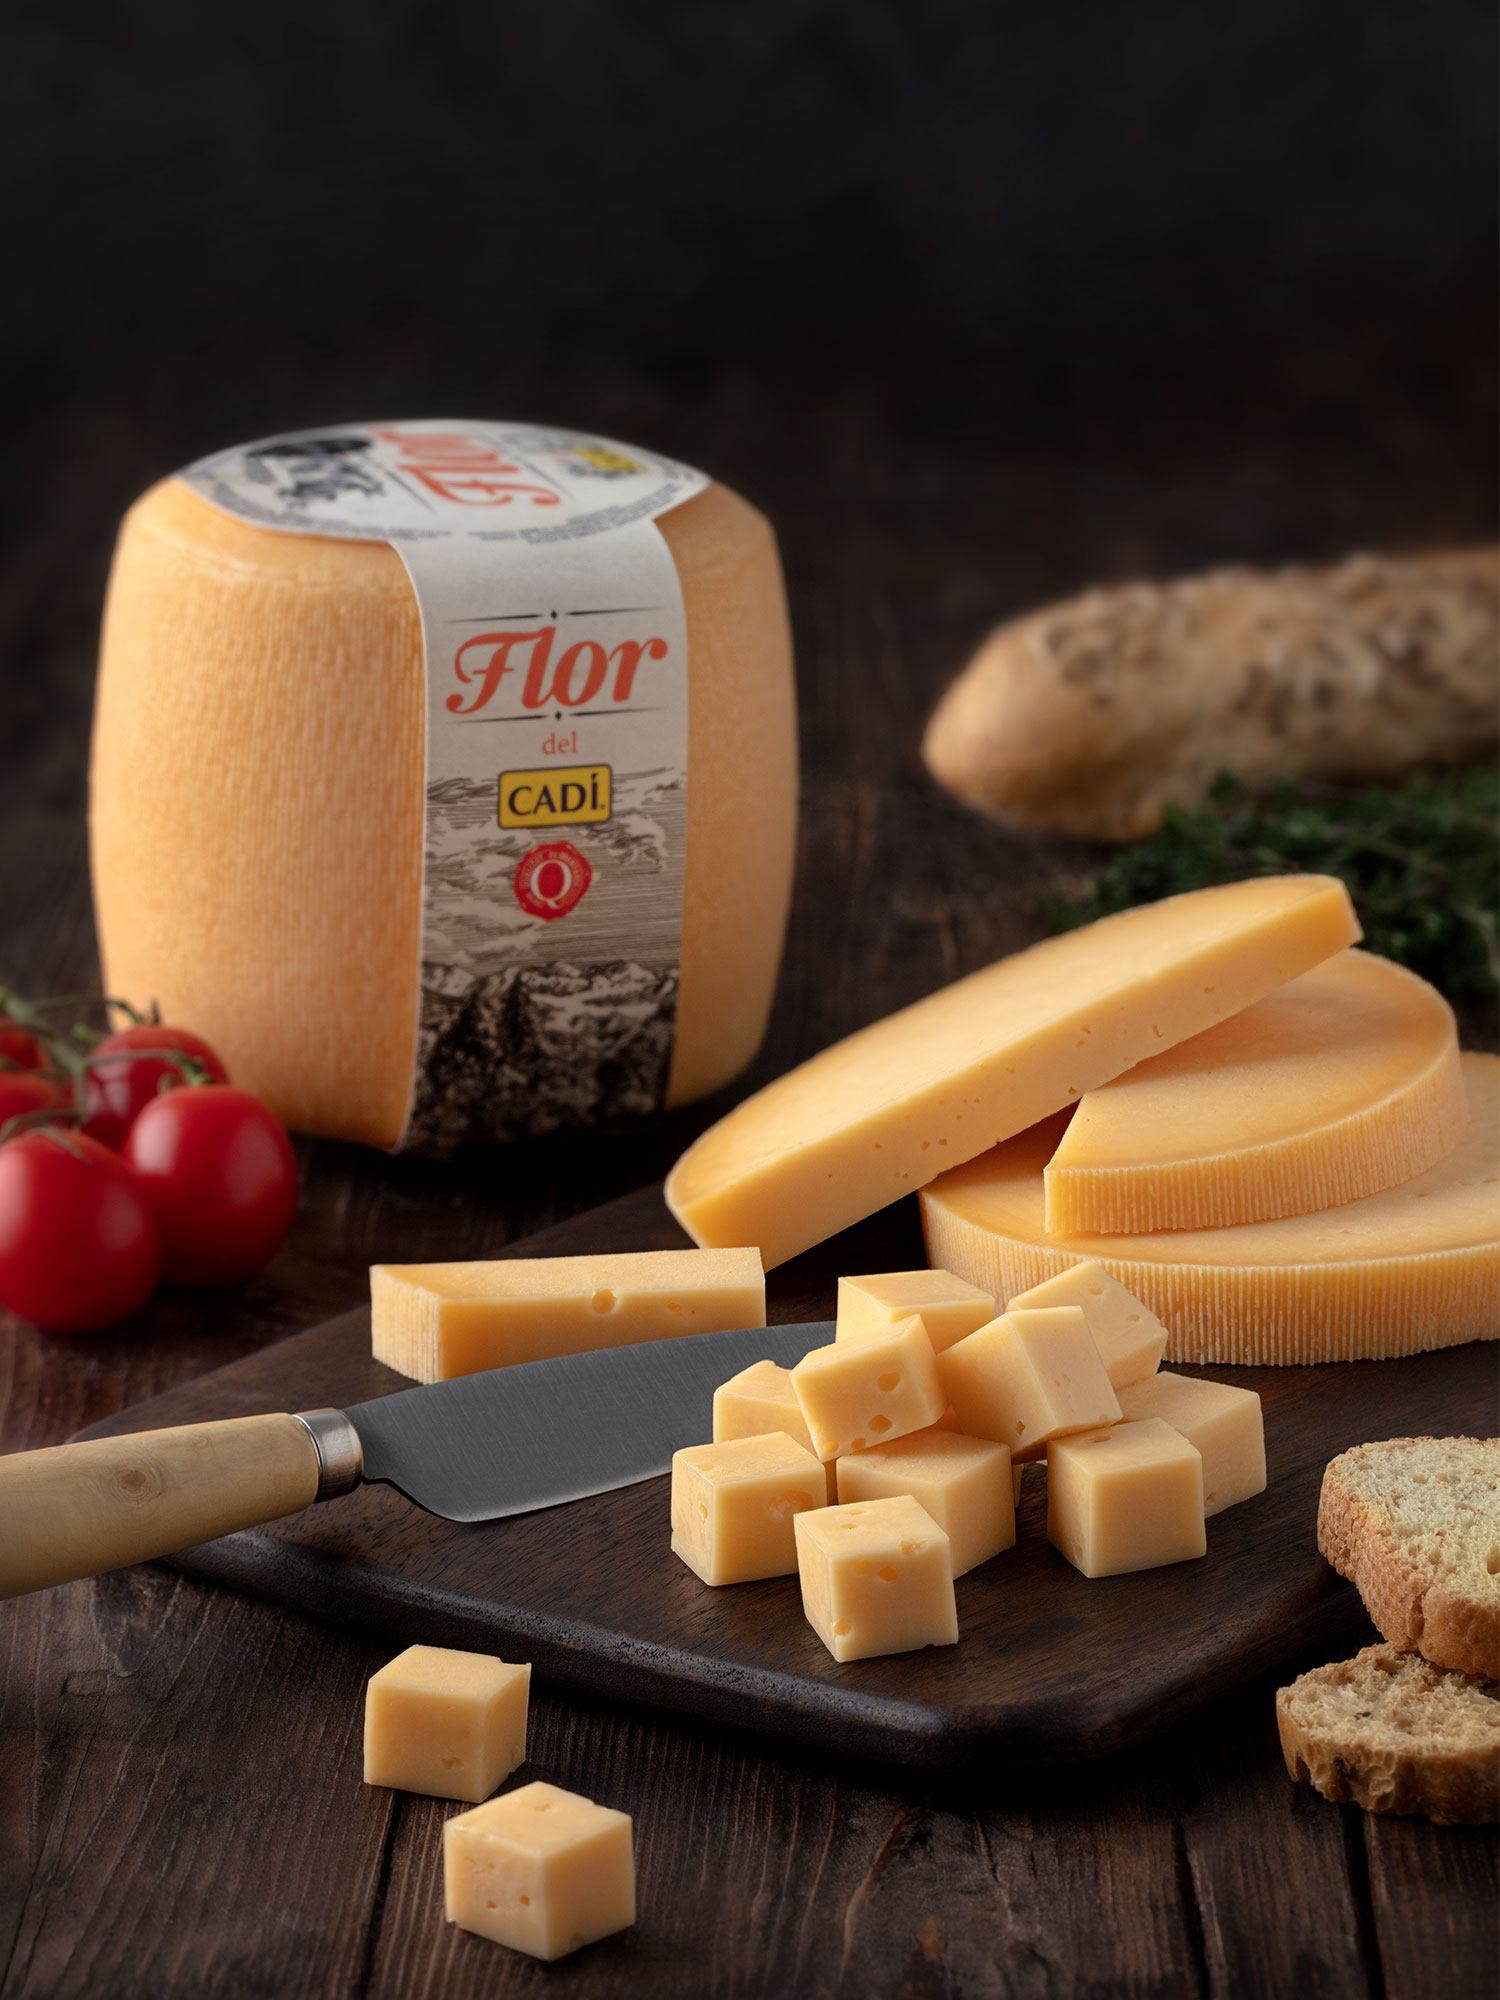 corina-landa-food-photography-fotografia-gastronomica-0187.jpg